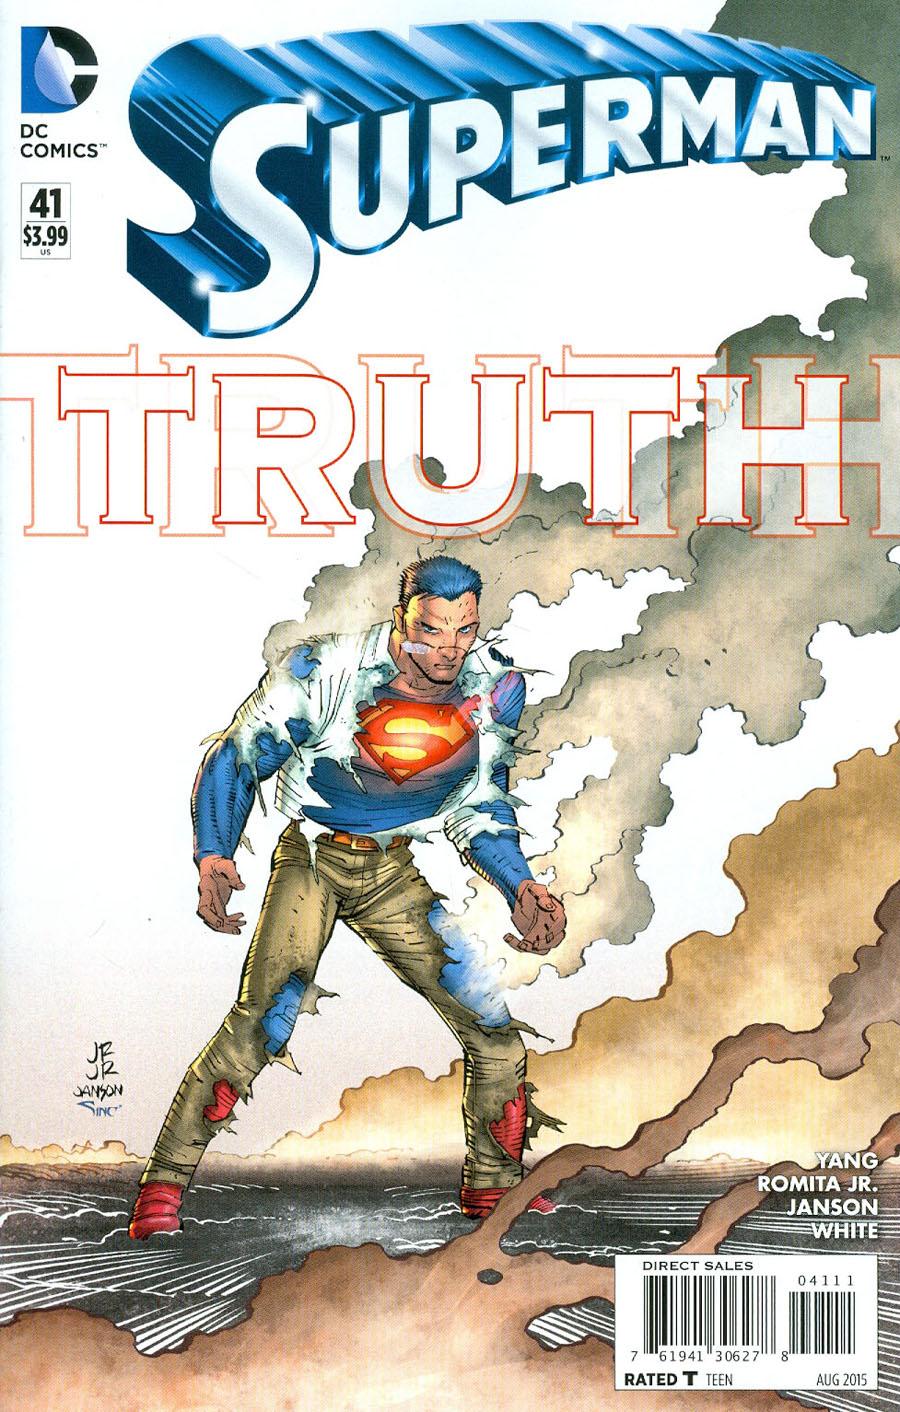 Superman Vol 4 #41 Cover A Regular John Romita Jr Cover